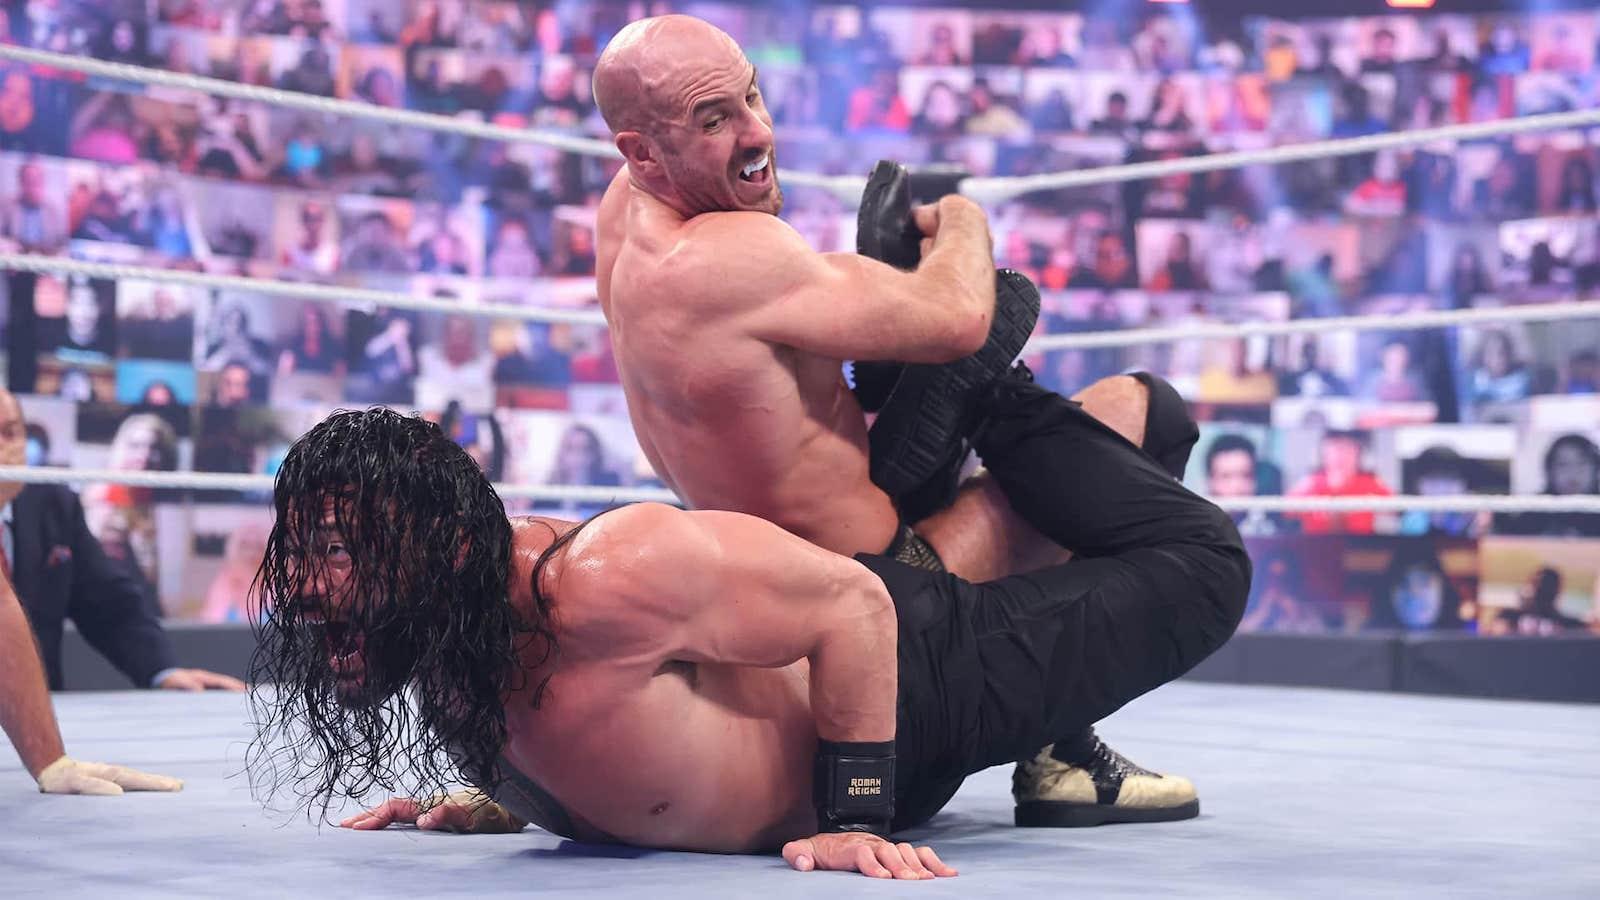 resultats wwe wrestlemania backlash